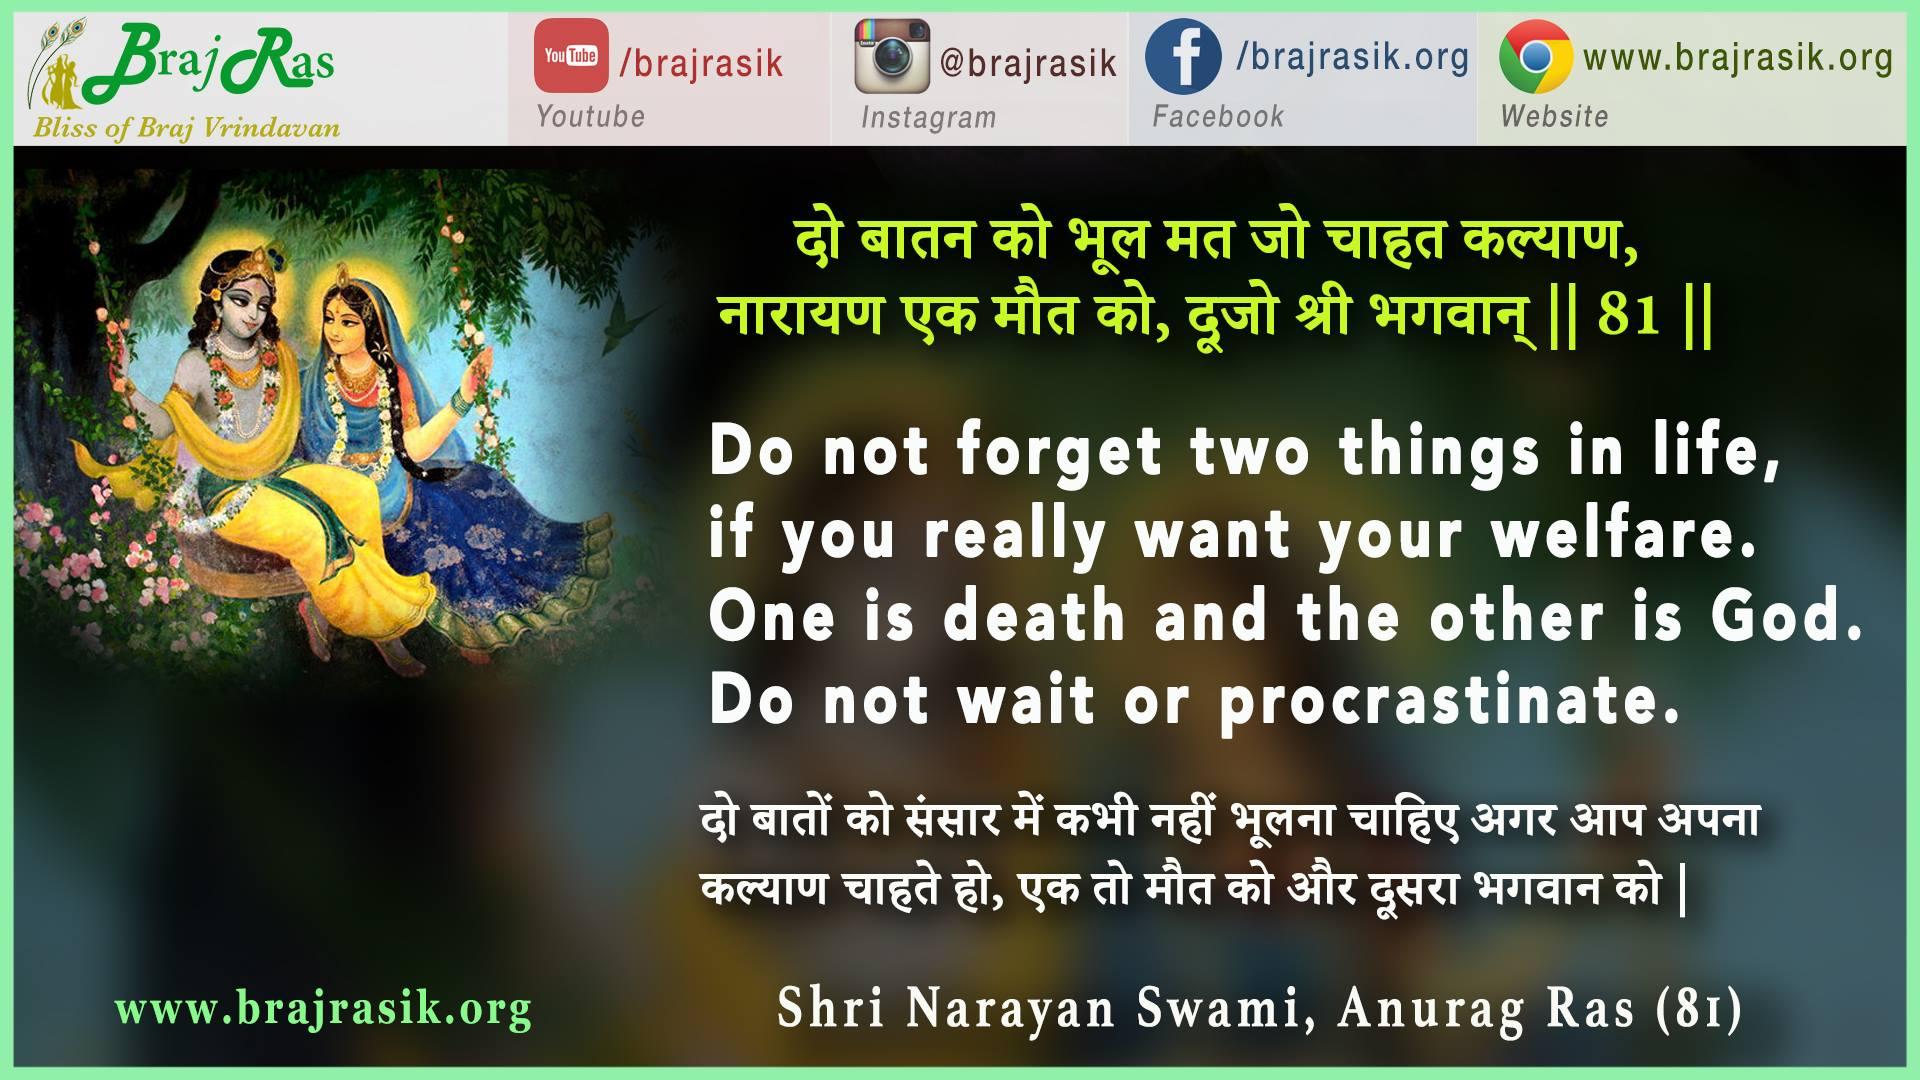 Do Batan Ko Bhool Mat Jo Chahat Kalyan - Shri Narayan Swami, Anurag Ras (81)